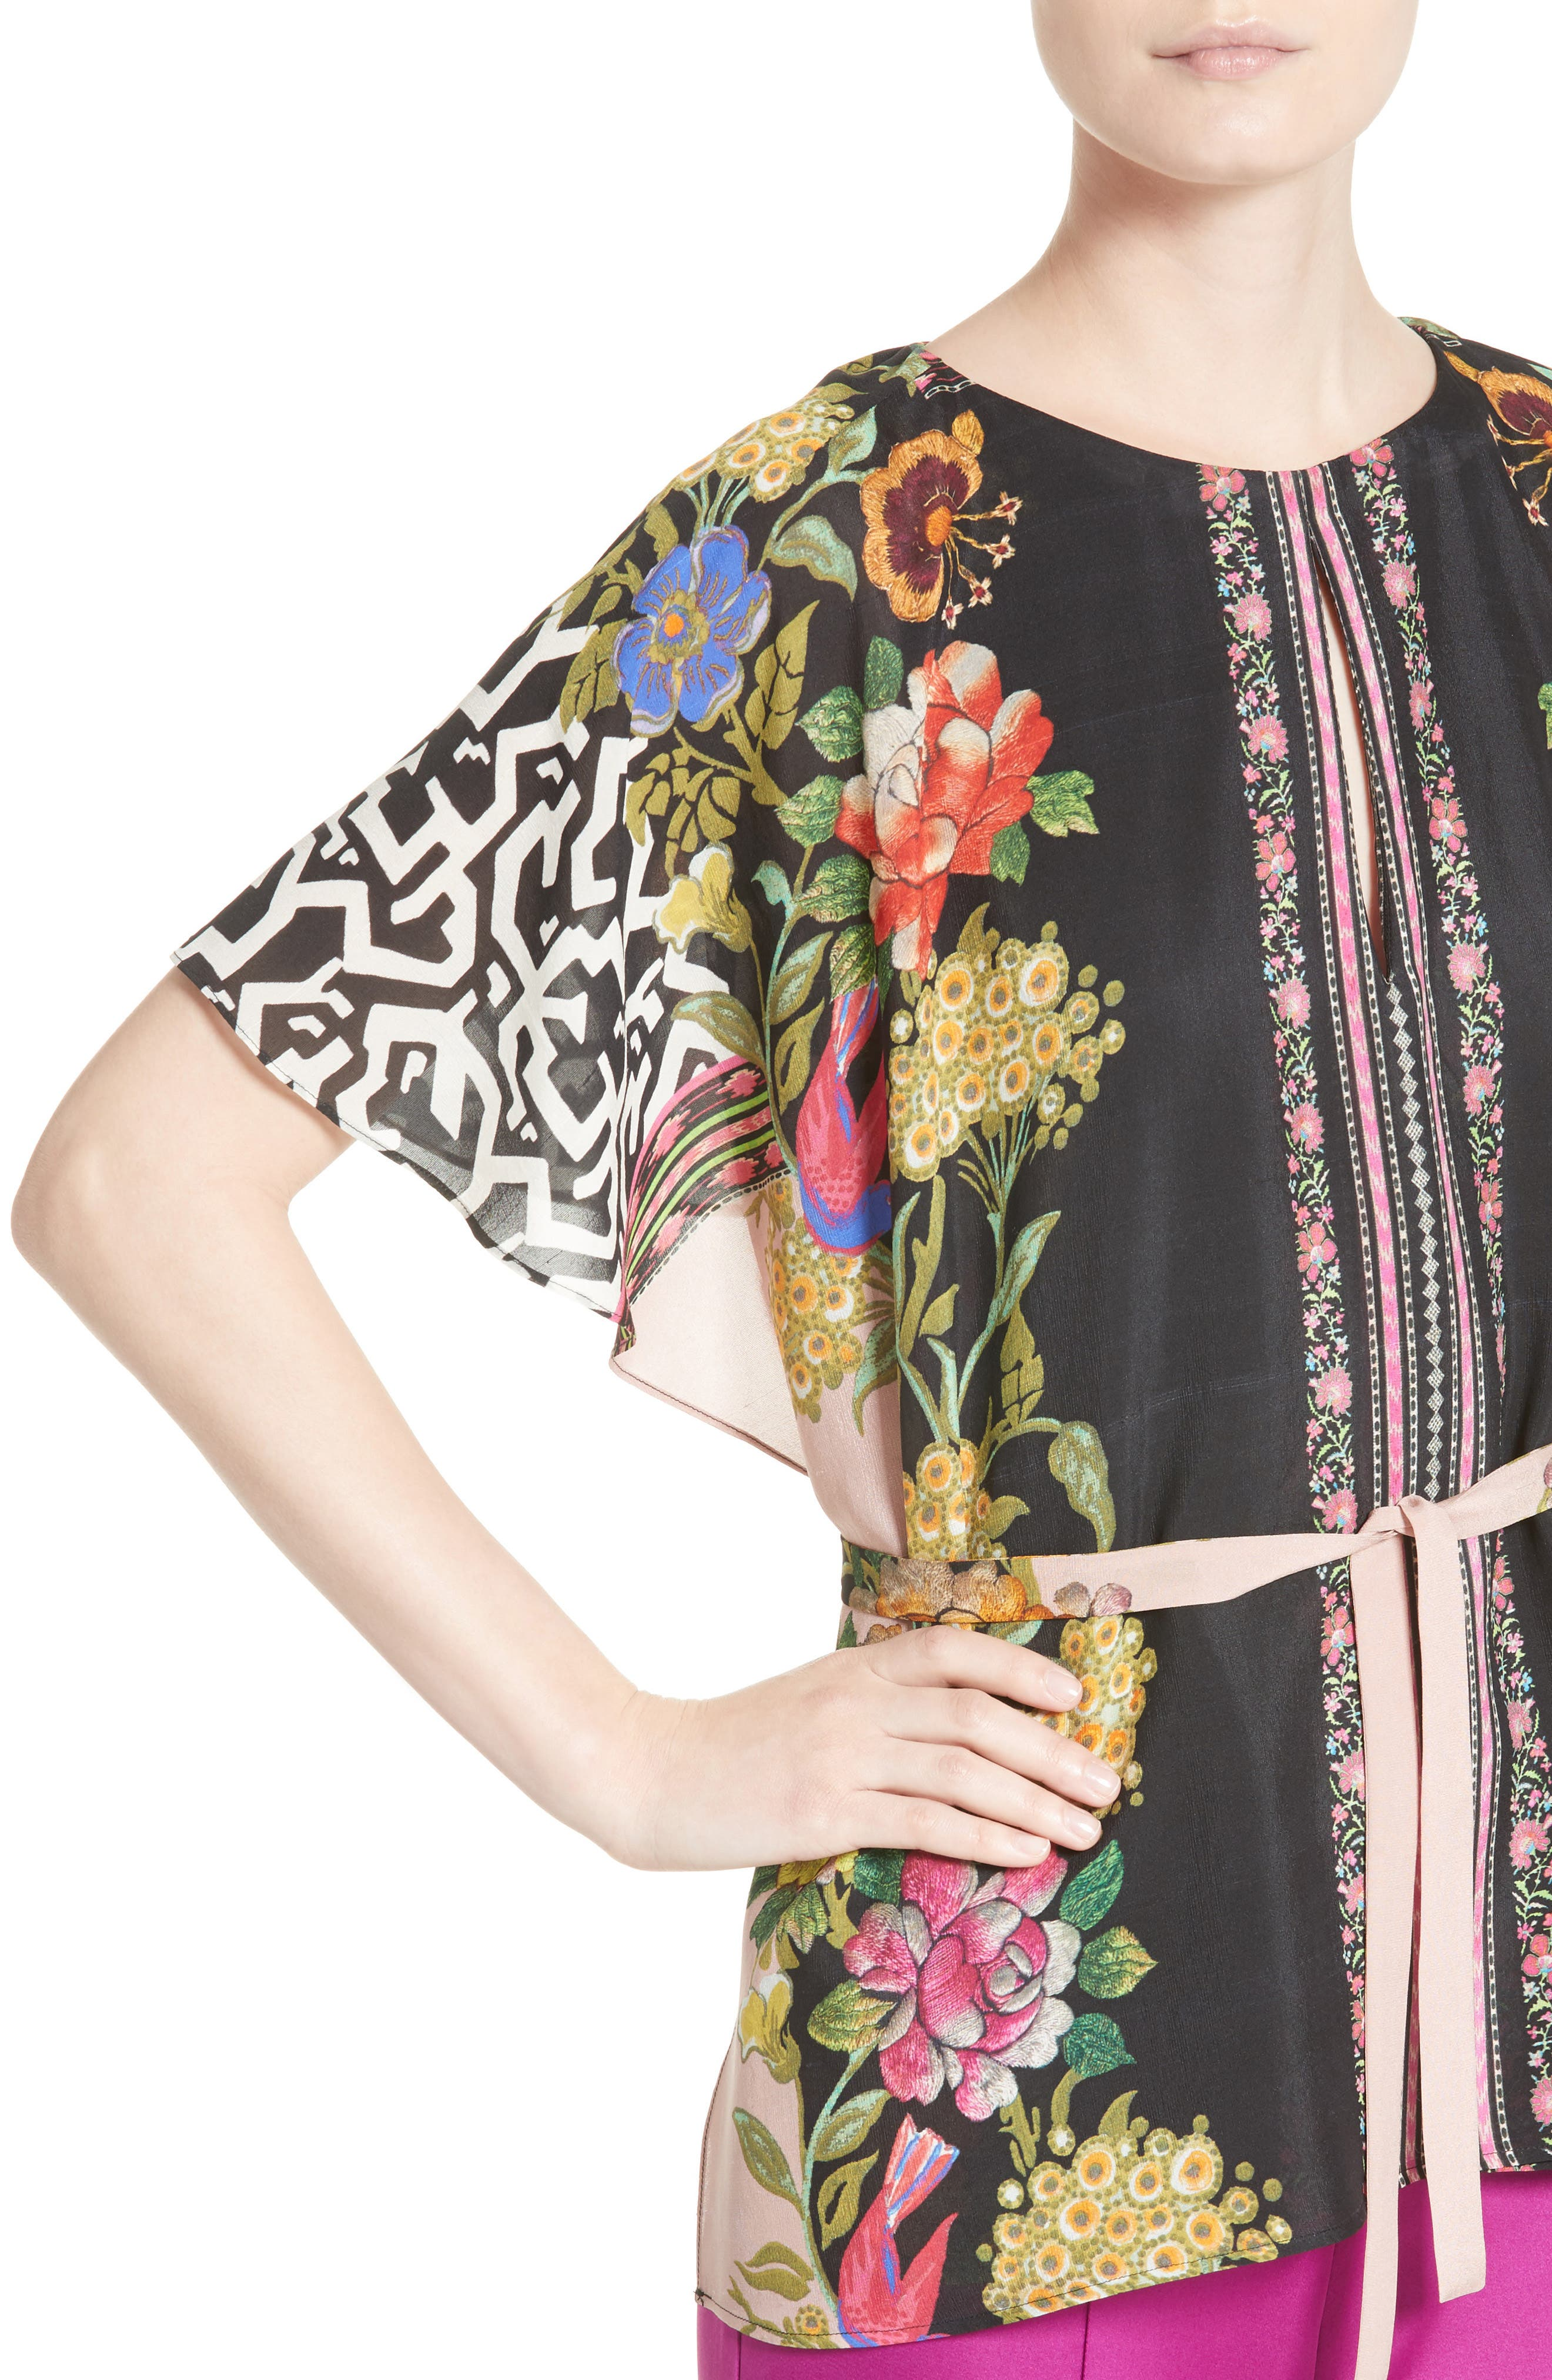 Floral & Maze Print Silk Blouse,                             Alternate thumbnail 4, color,                             650